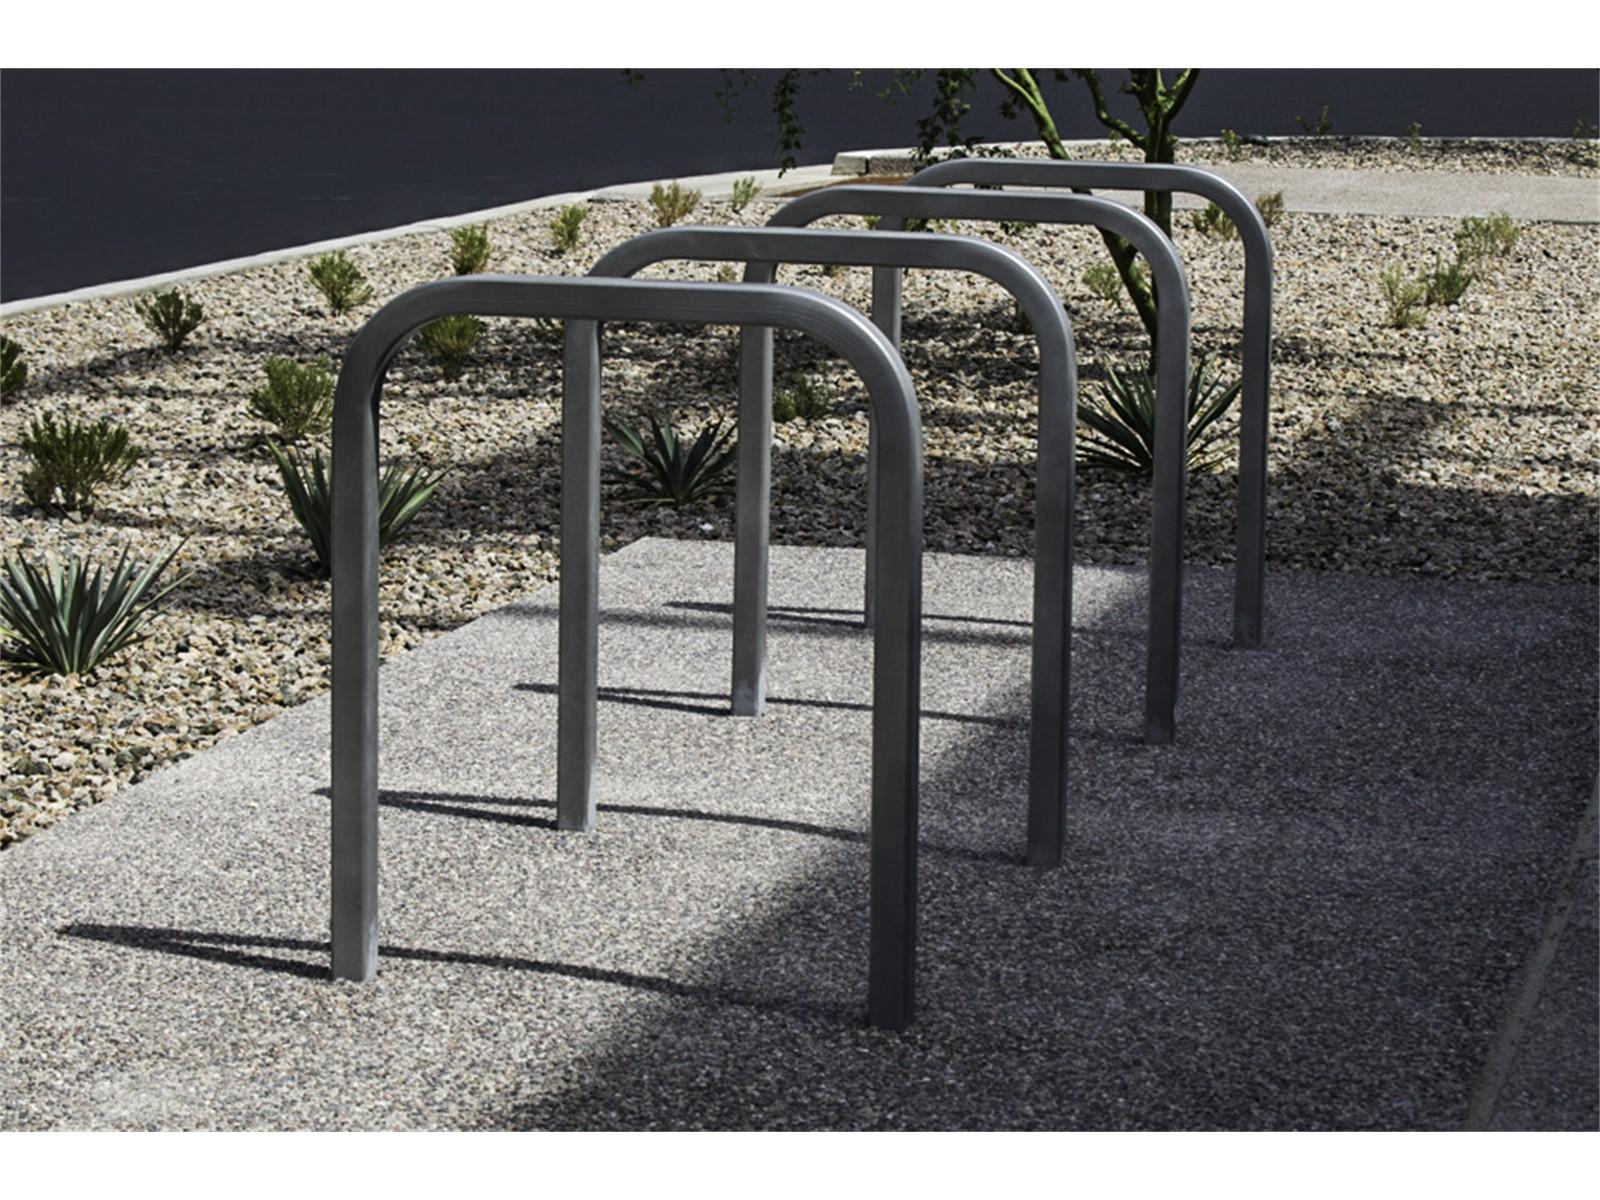 Exterior Systems Bike Racks